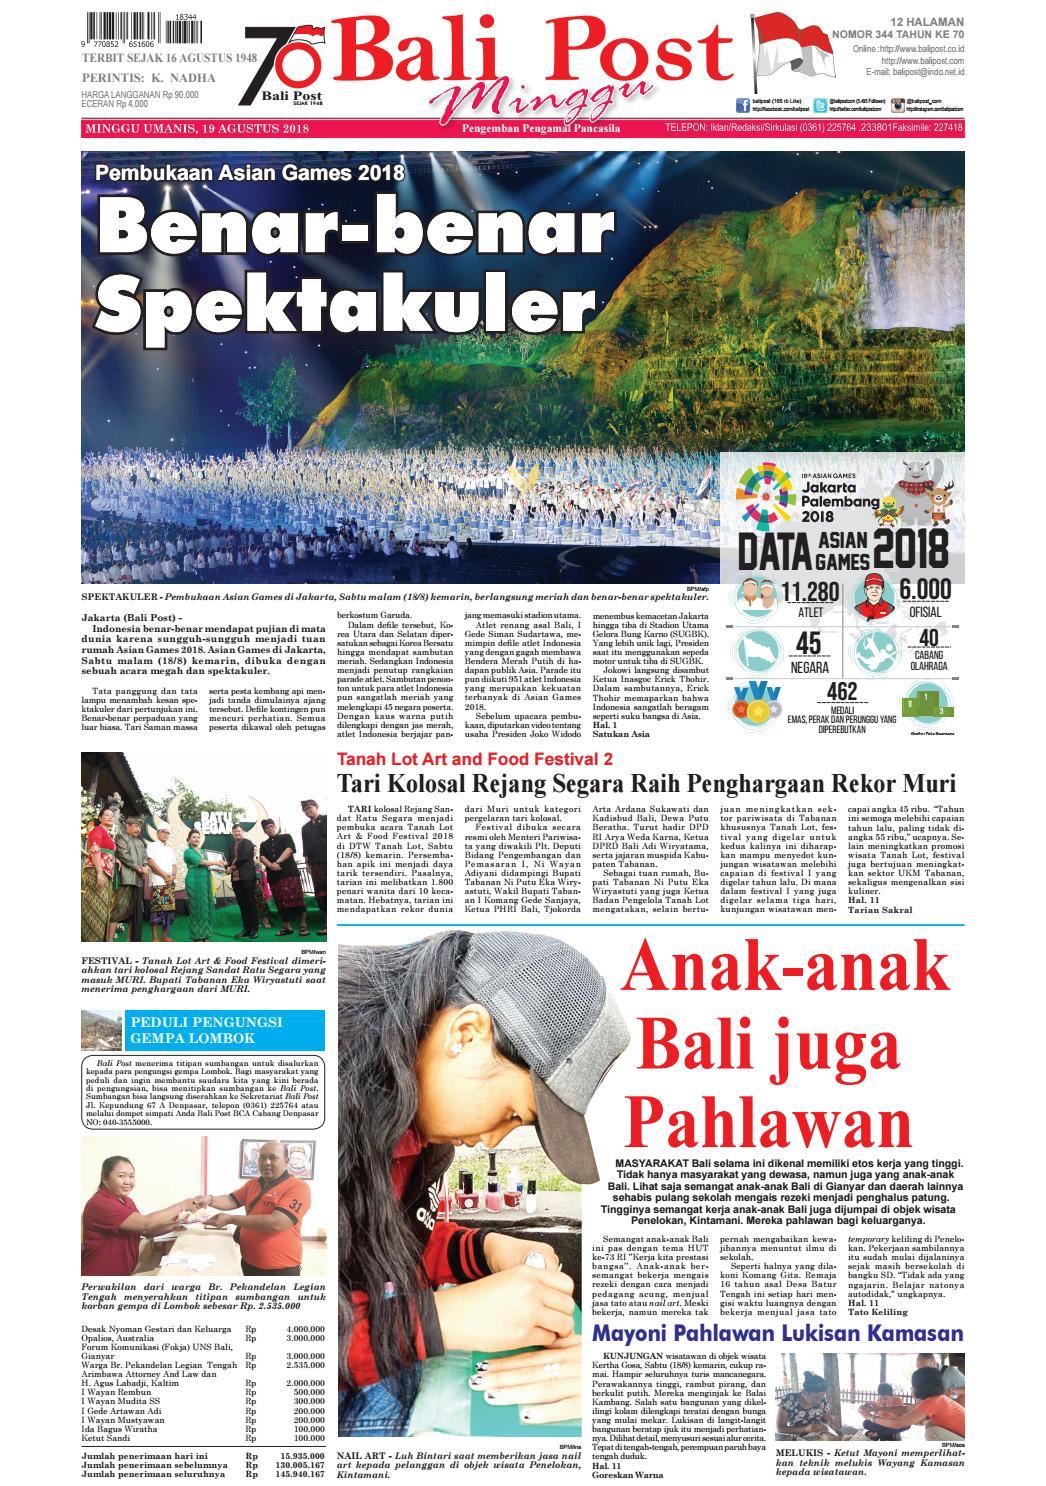 Edisi Minggu 19 Agustus 2018 Balipost Com By E Paper Kmb Issuu